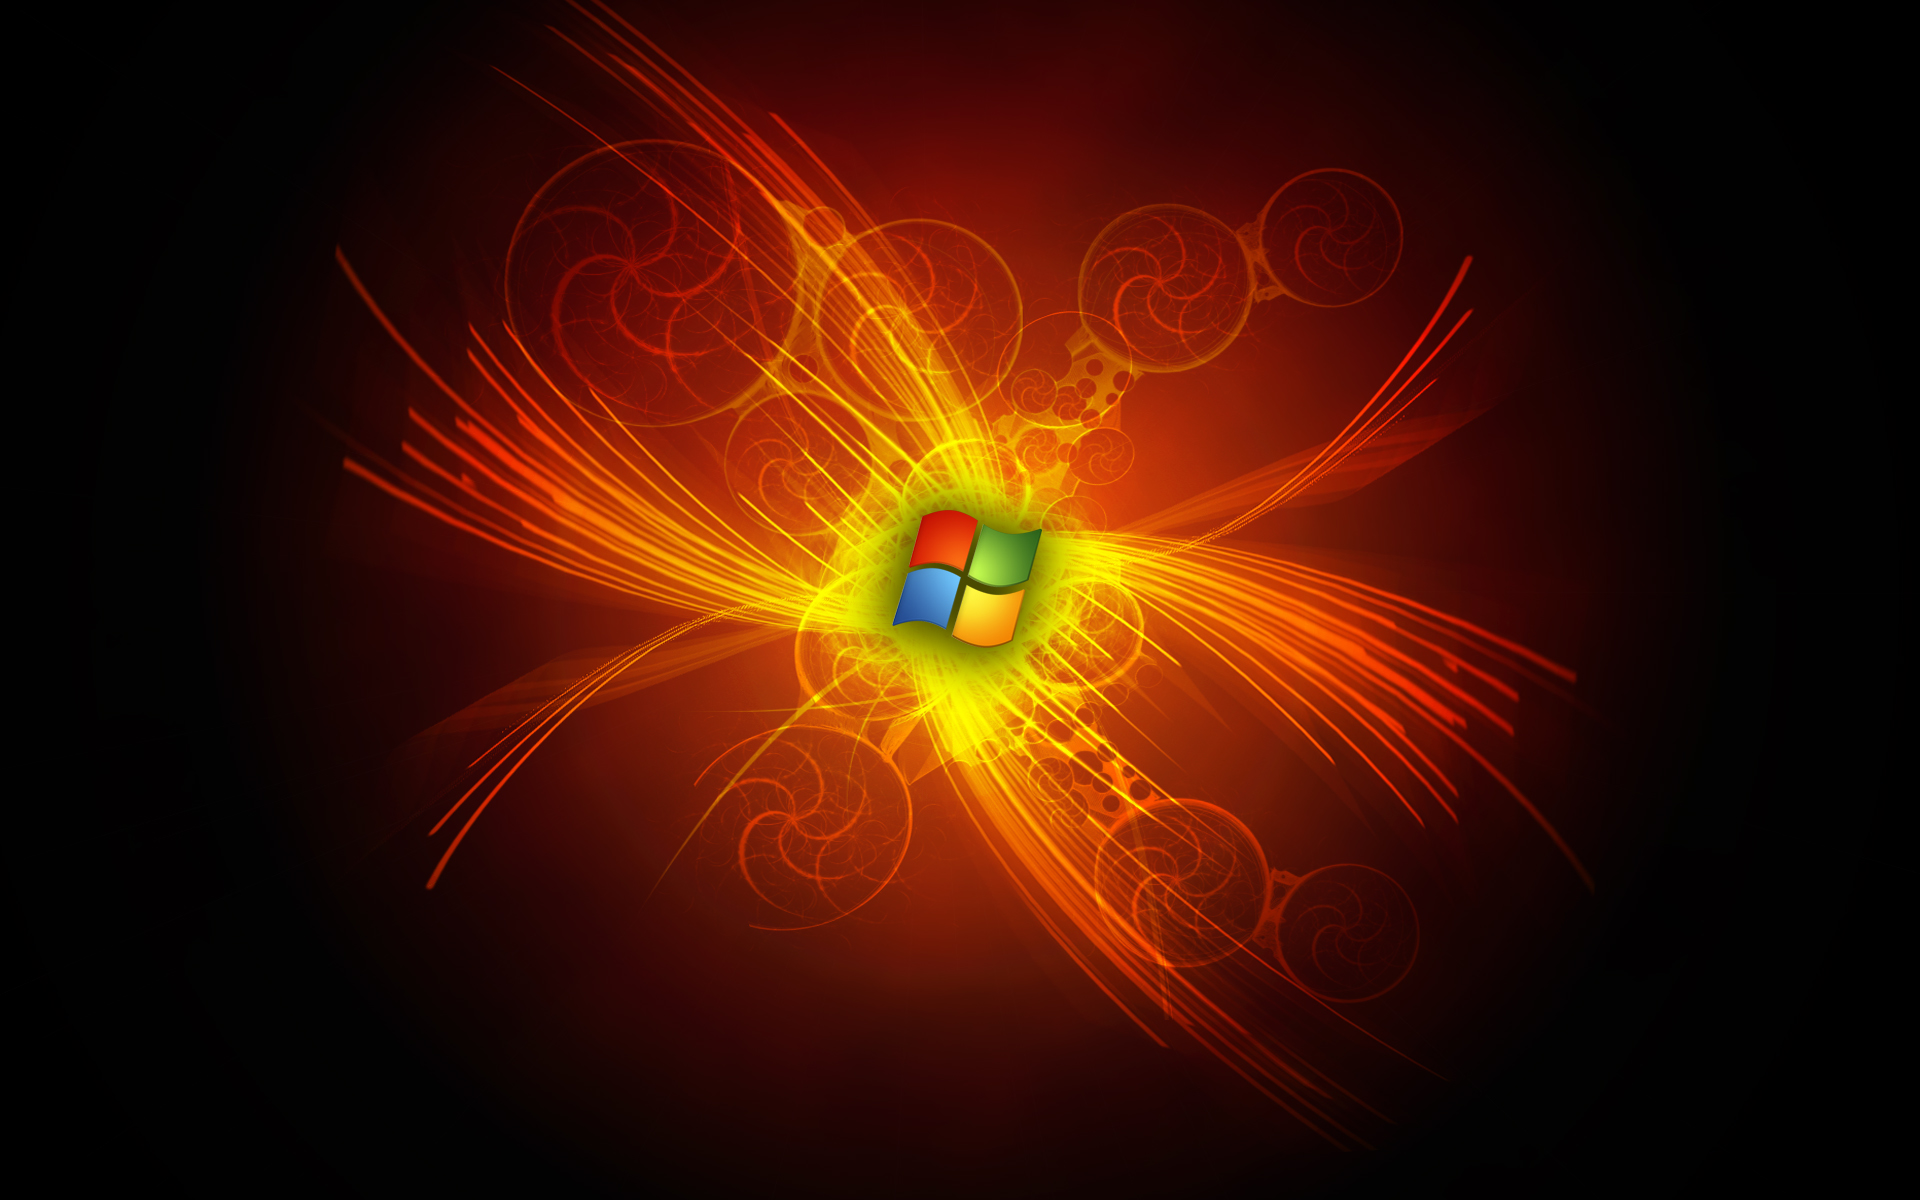 Windows 7 Black Edition Screensaver